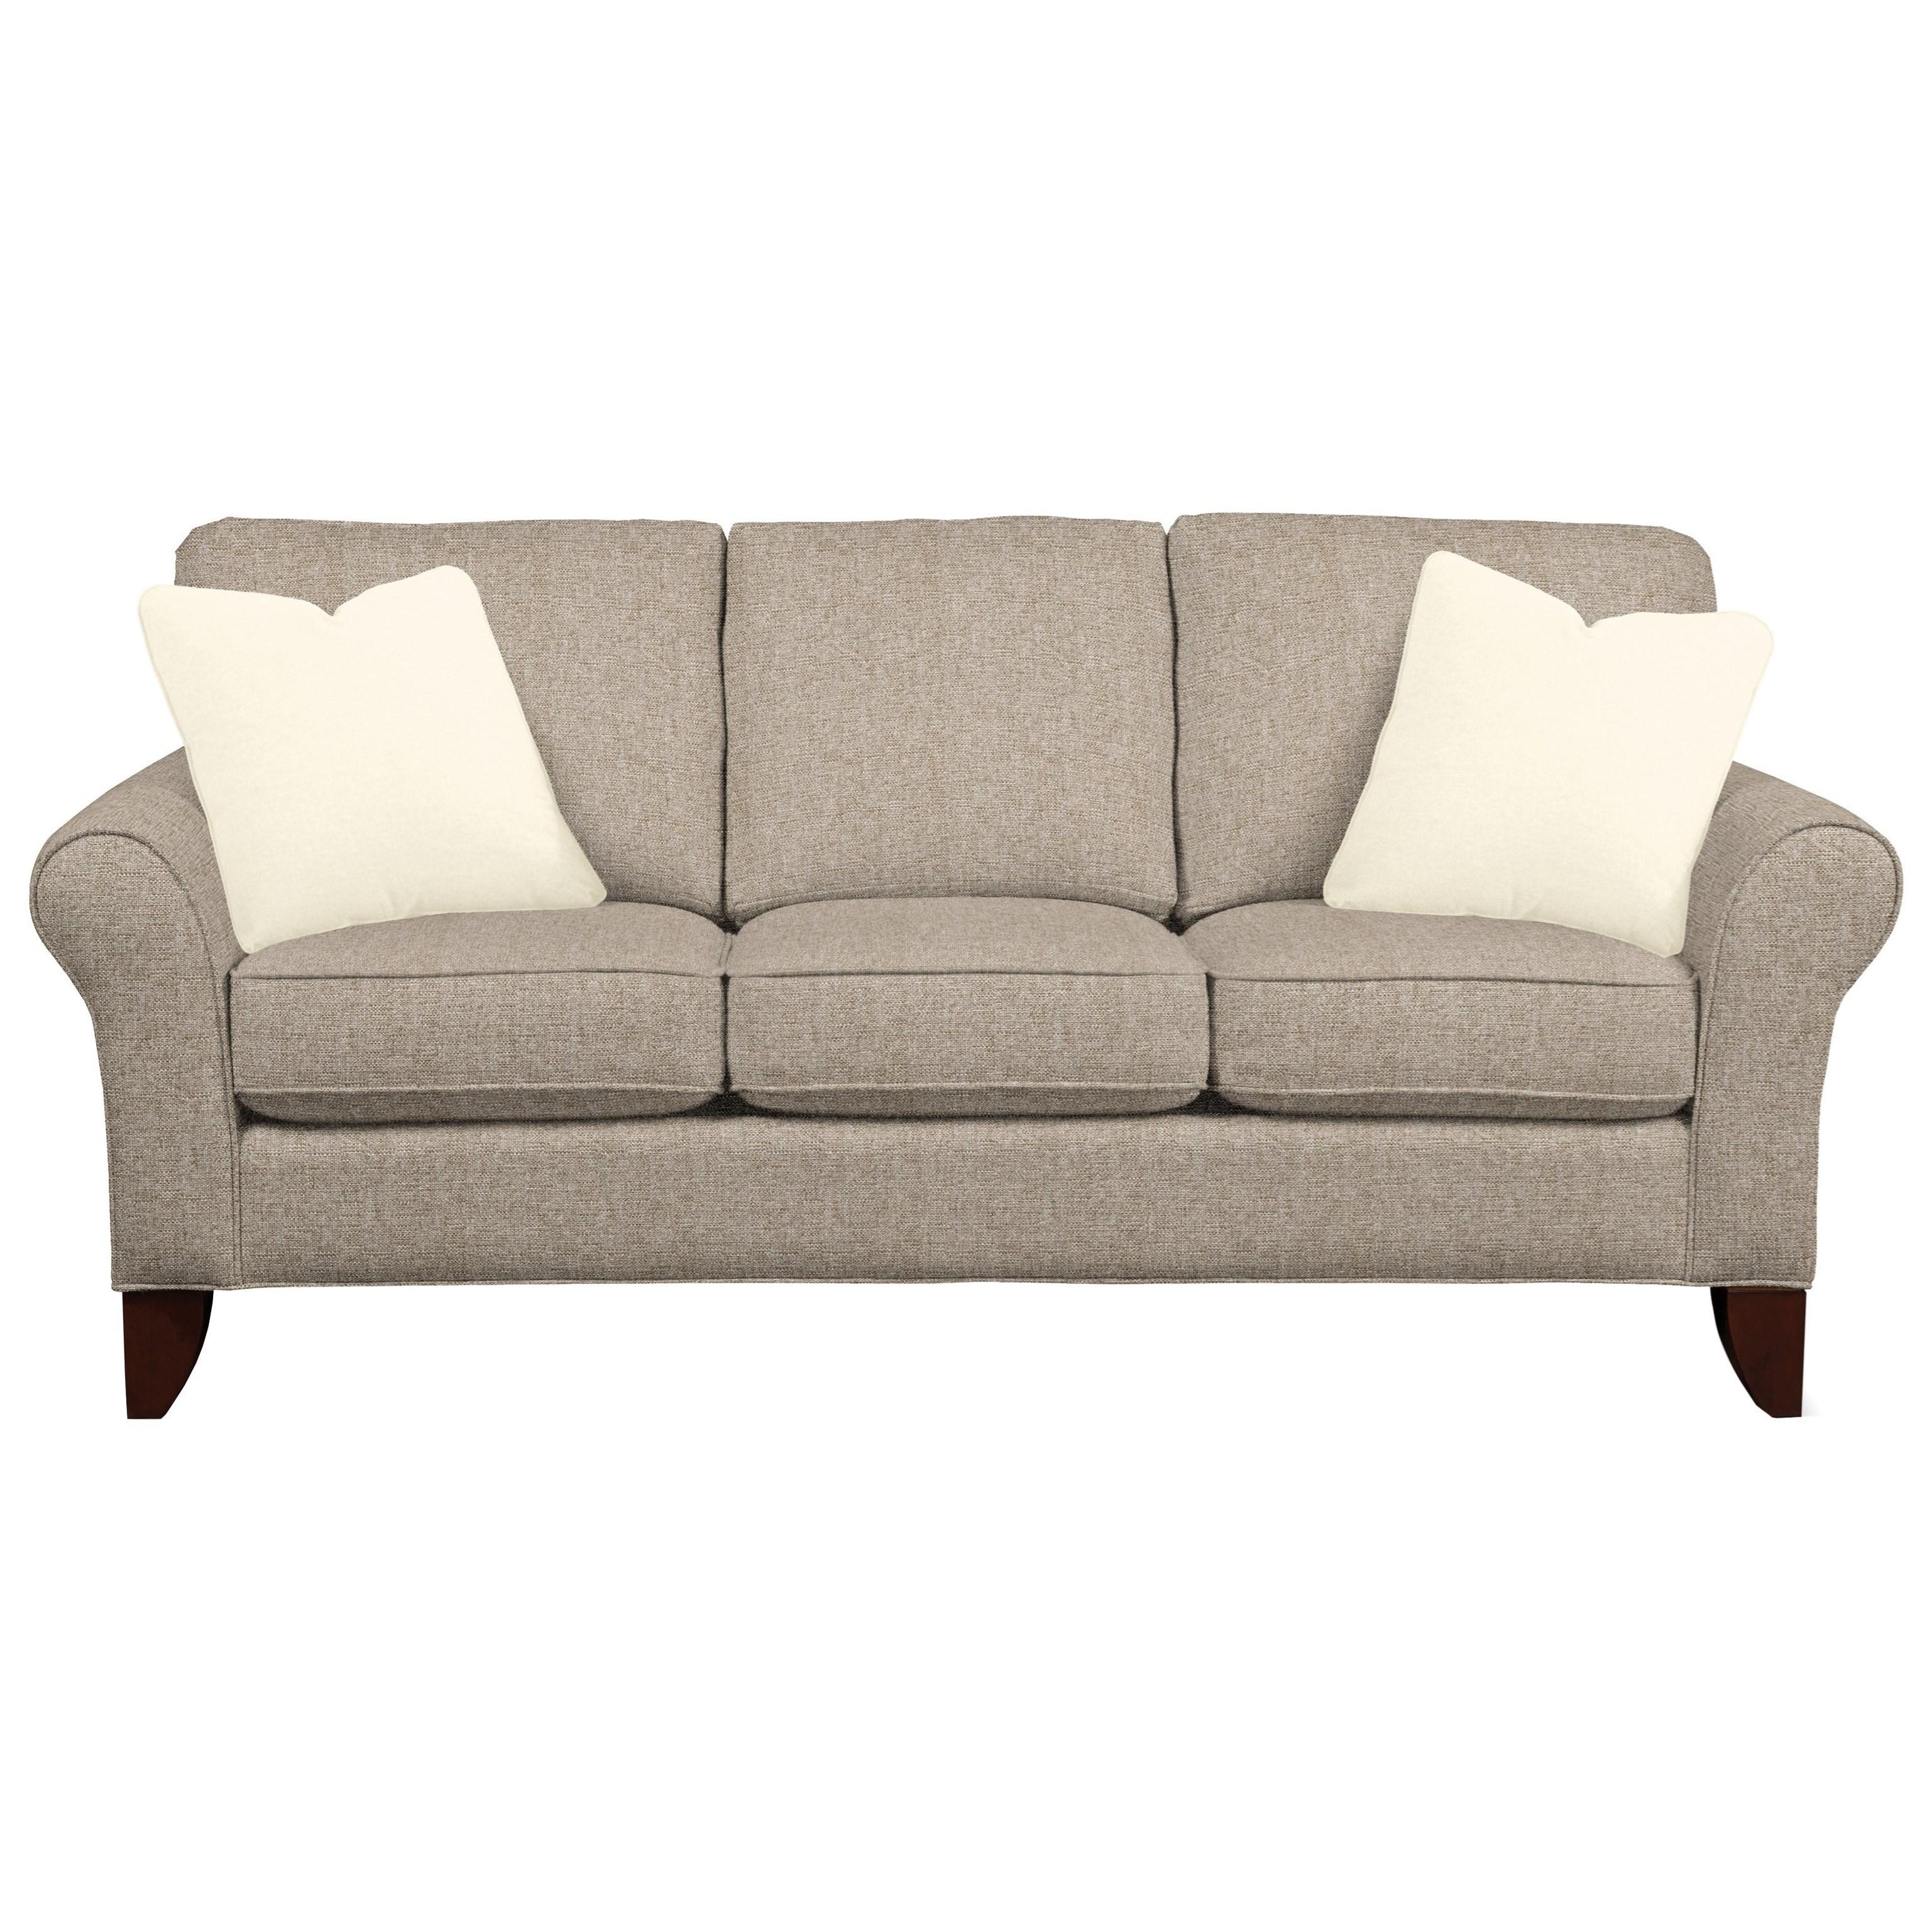 7551 Sofa by Craftmaster at Dean Bosler's